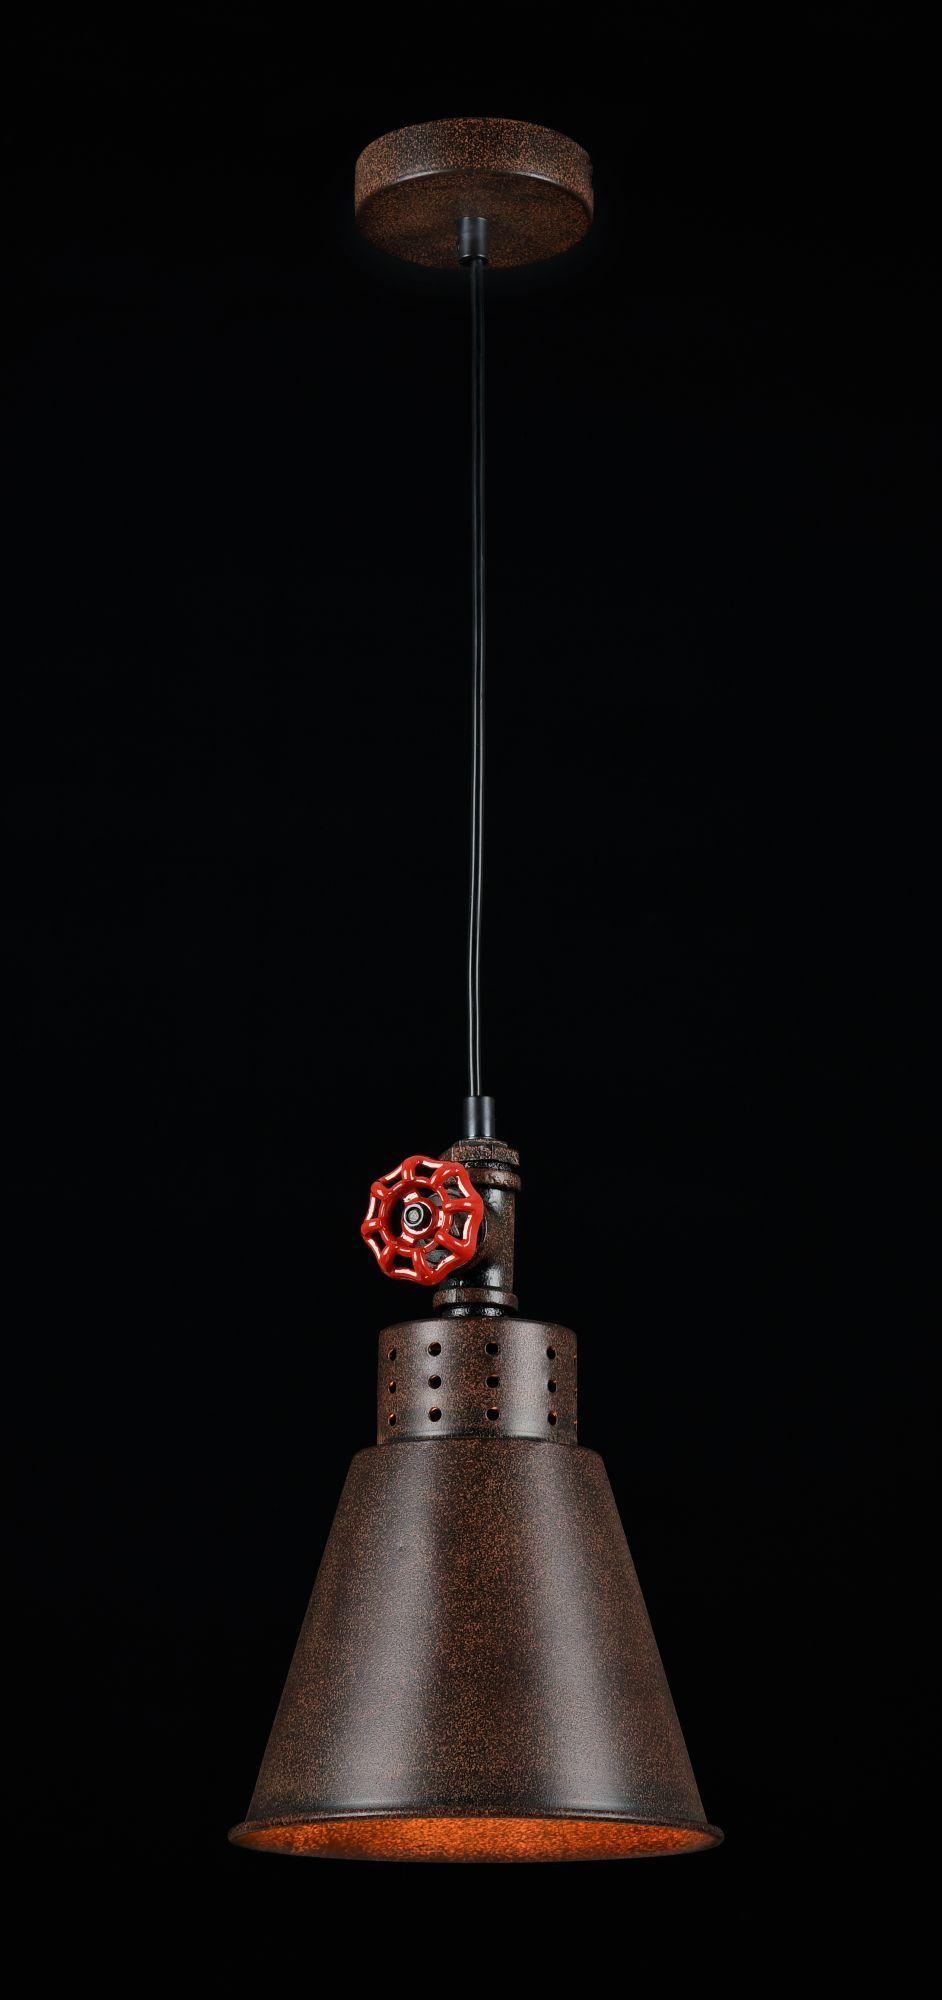 Подвесной светильник Maytoni Valve T020-01-R, 1xE27x60W, коричневый, металл - фото 3